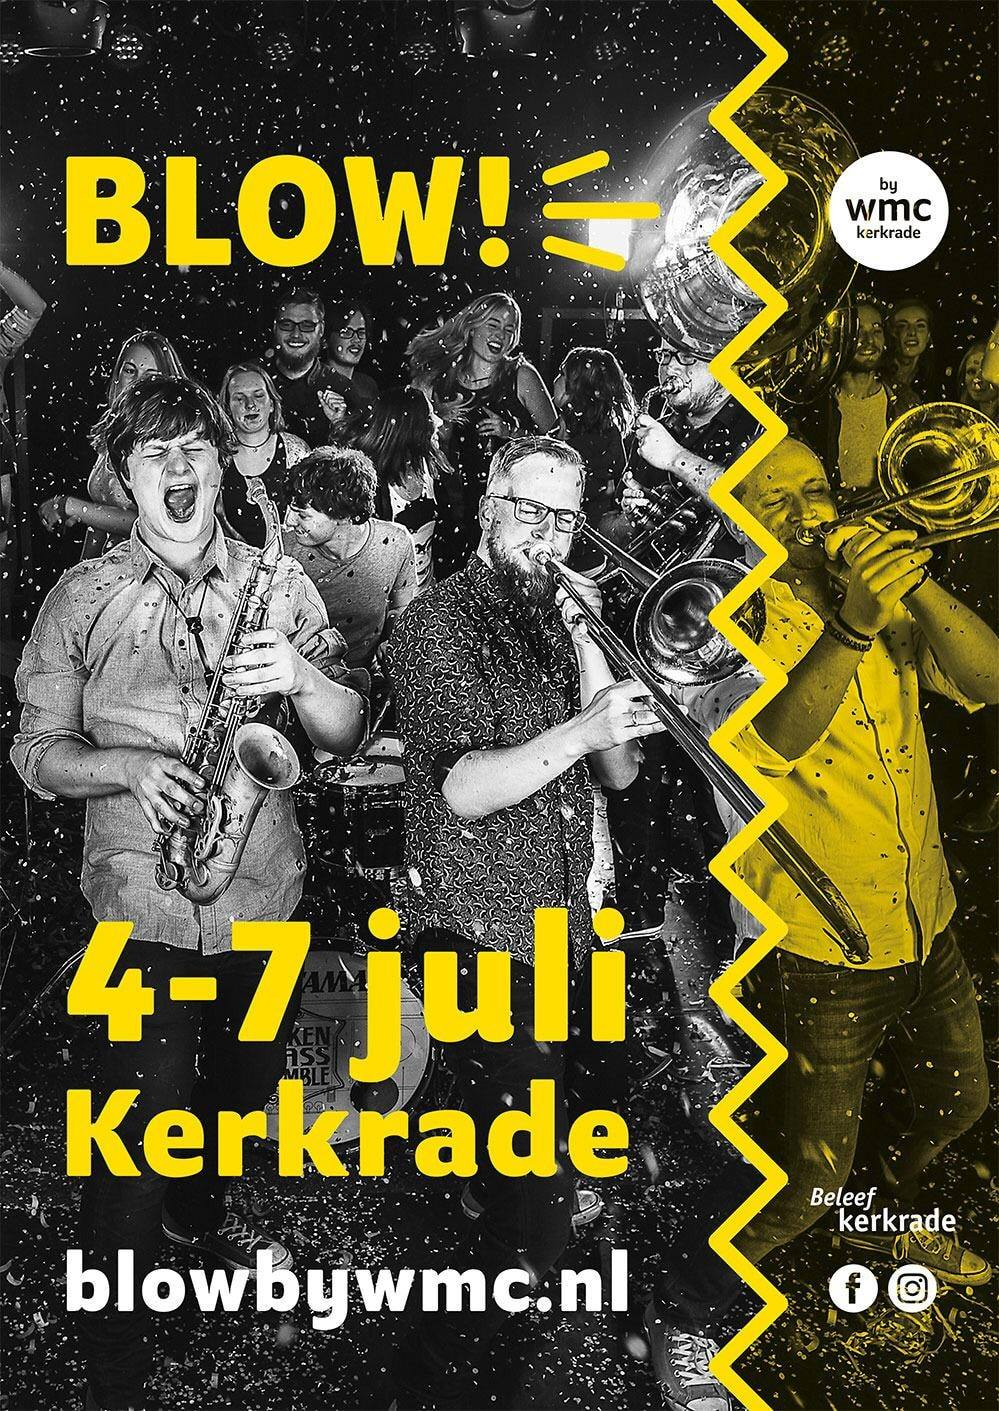 BLOW by WMC Kerkrade